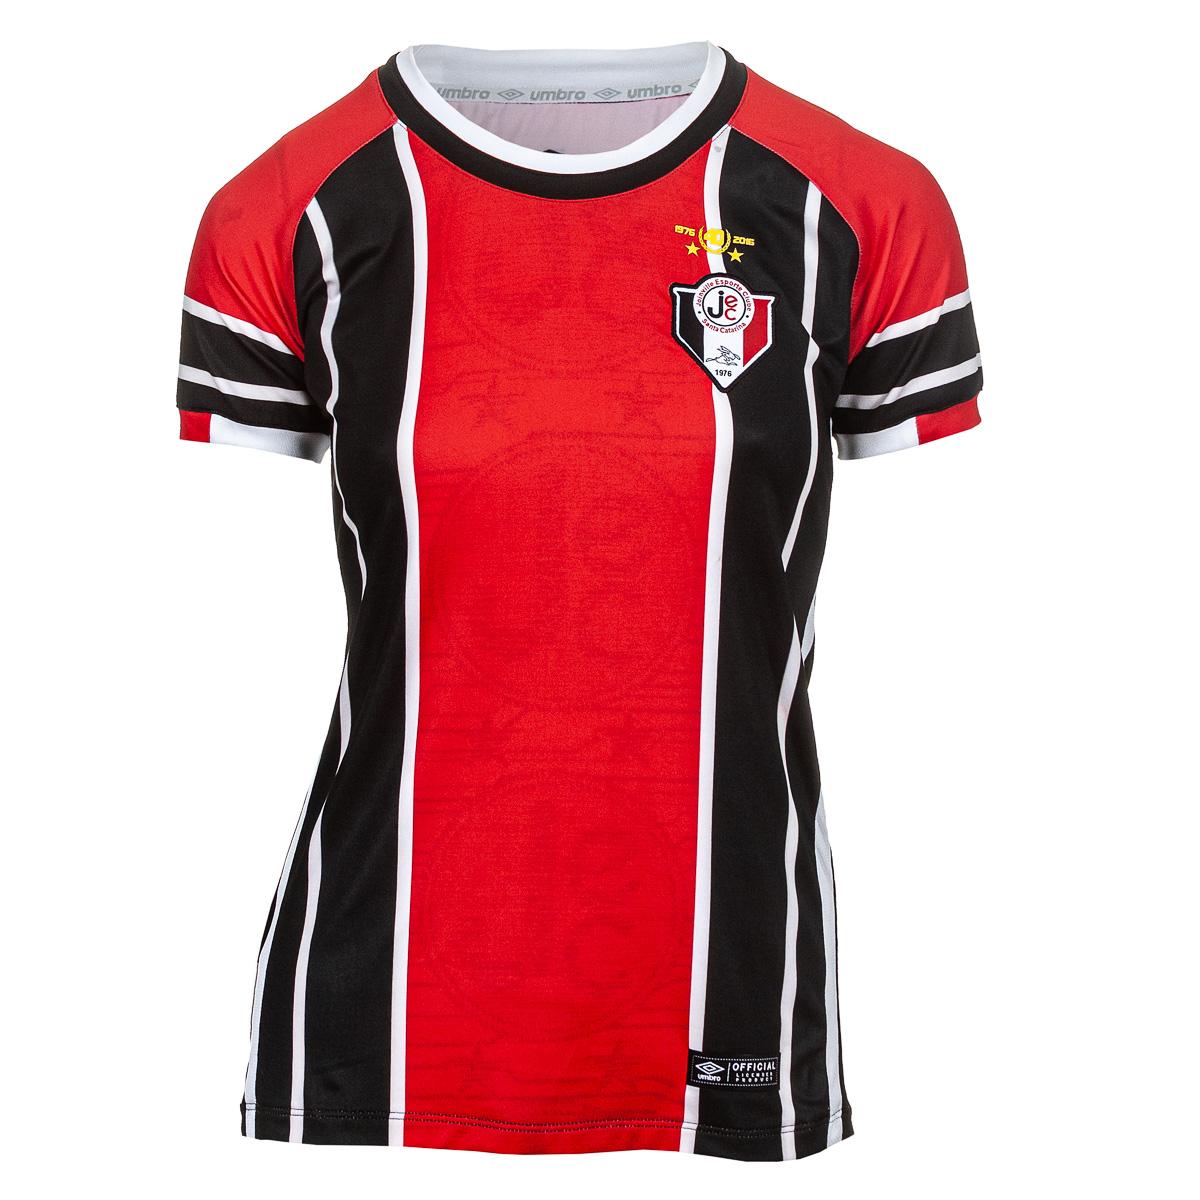 Camisa Fem. Umbro Joinvile Of. 1 Futebol - Vermelho/Branco